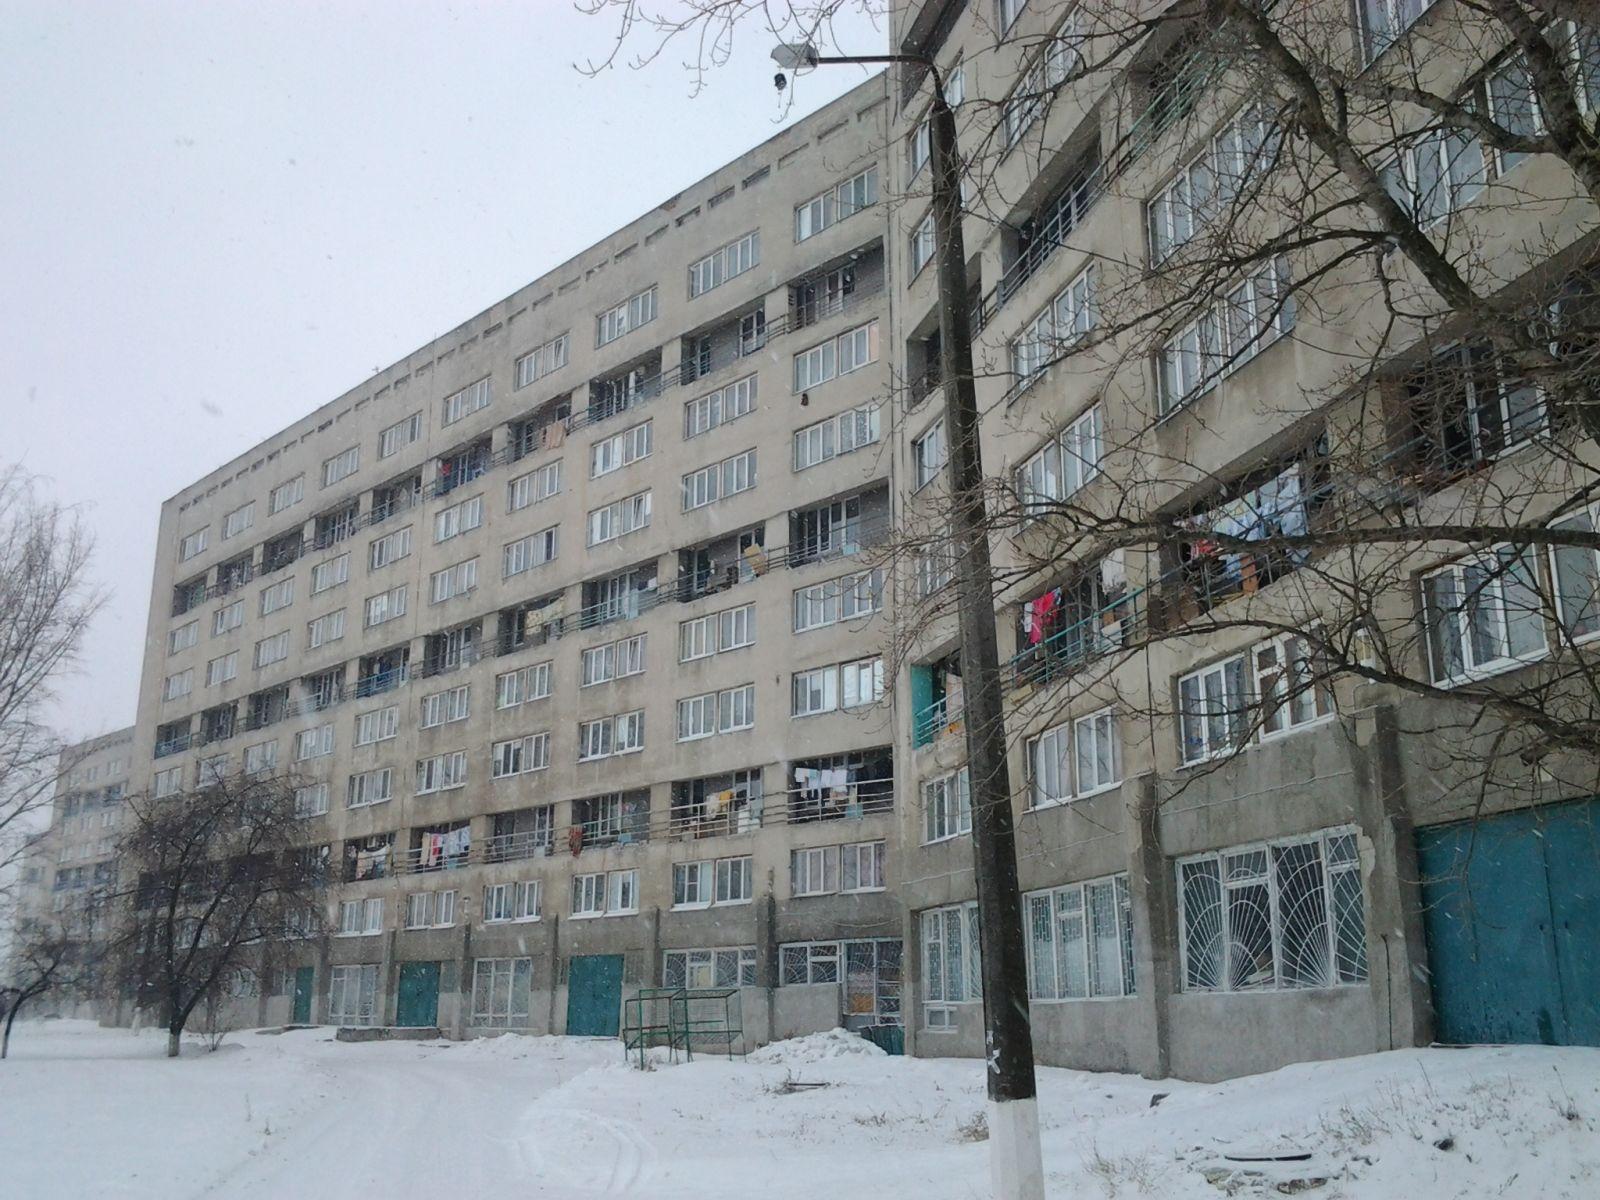 Общежитие № 8 НАУ «ХАИ» - Харьков | 1200x1600